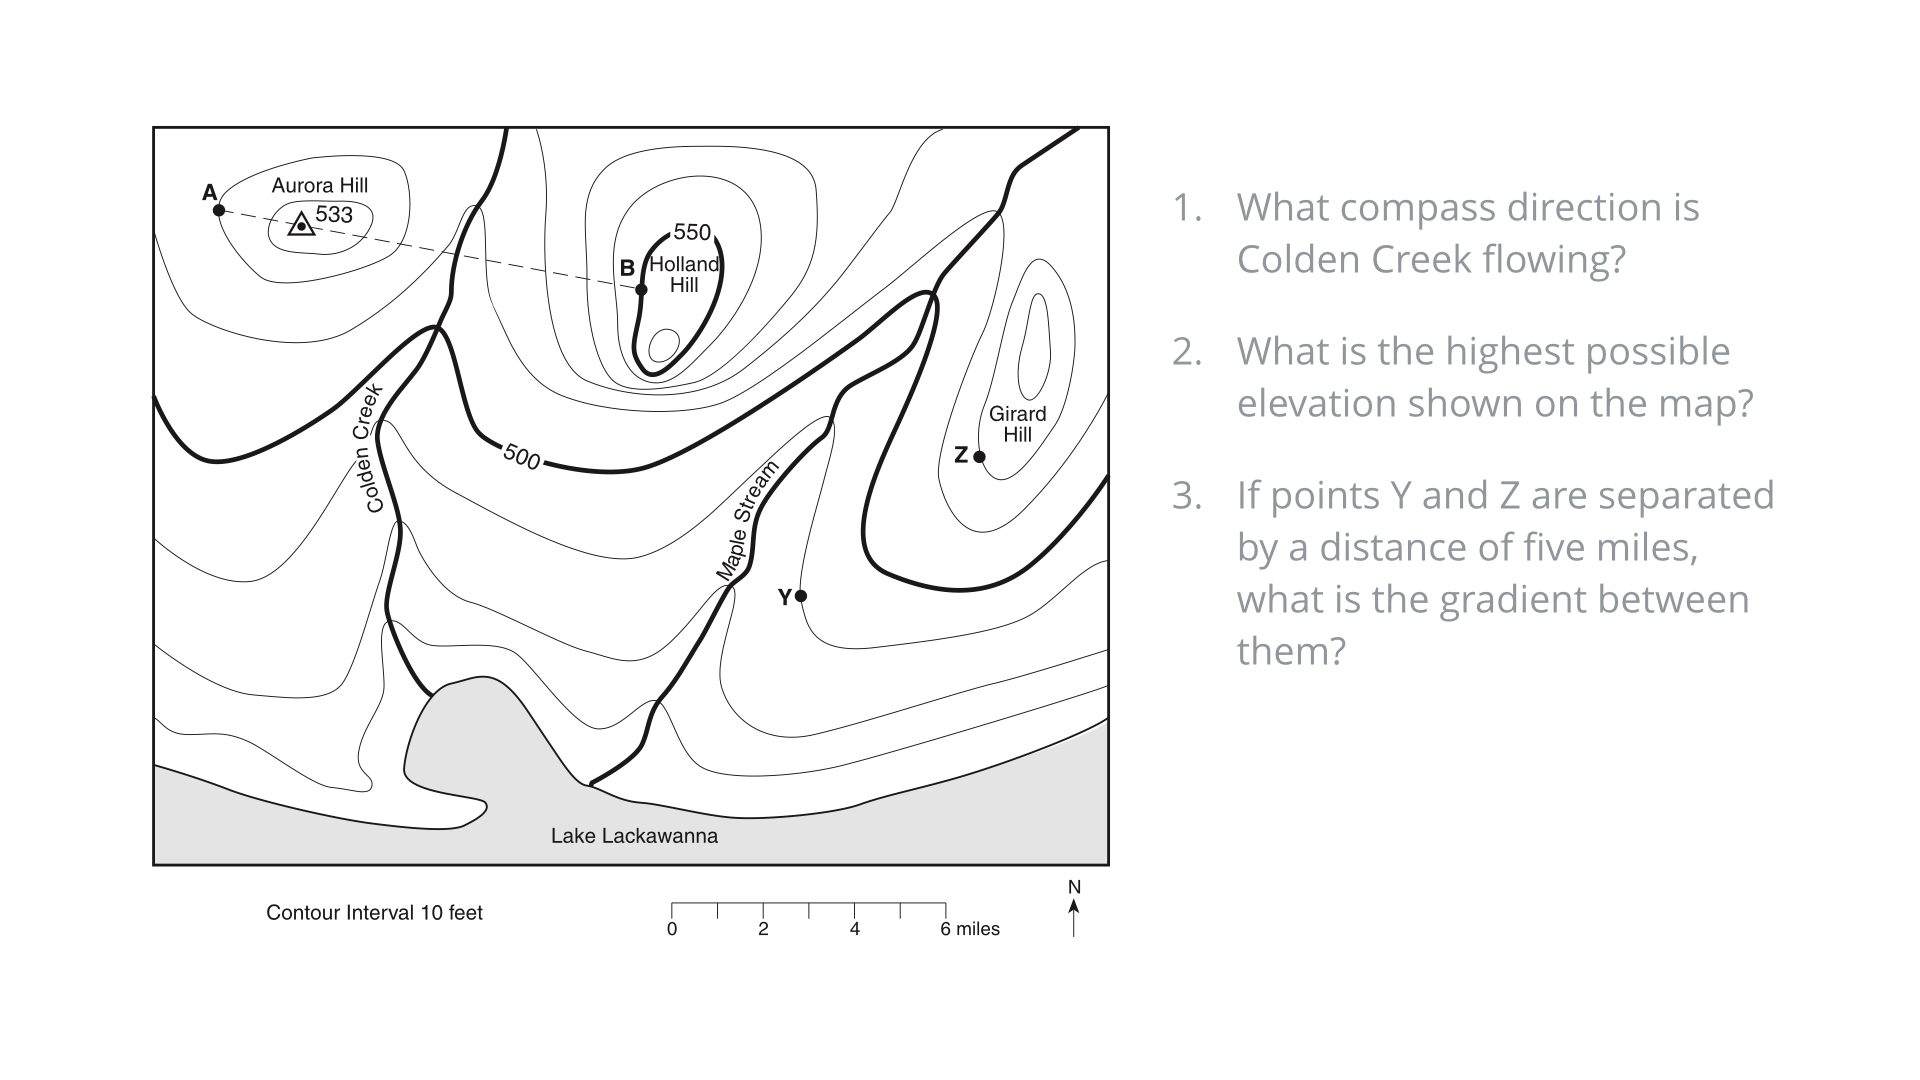 regents earth science at hommocks middle school topographic maps lab 2. Black Bedroom Furniture Sets. Home Design Ideas